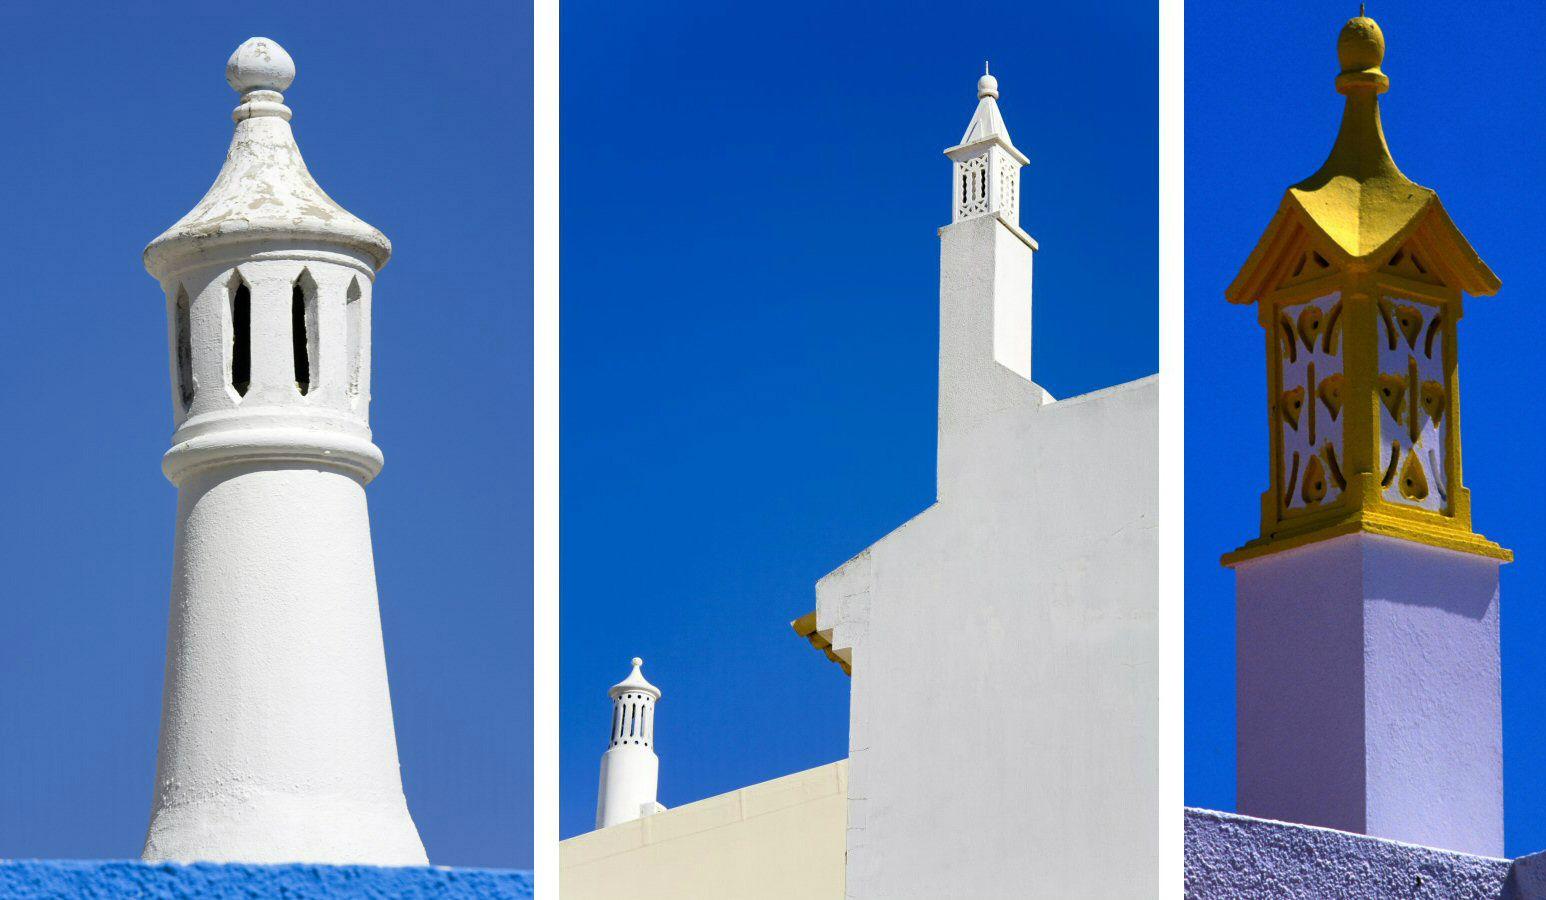 three photos, detailed chimney pots against blue sky